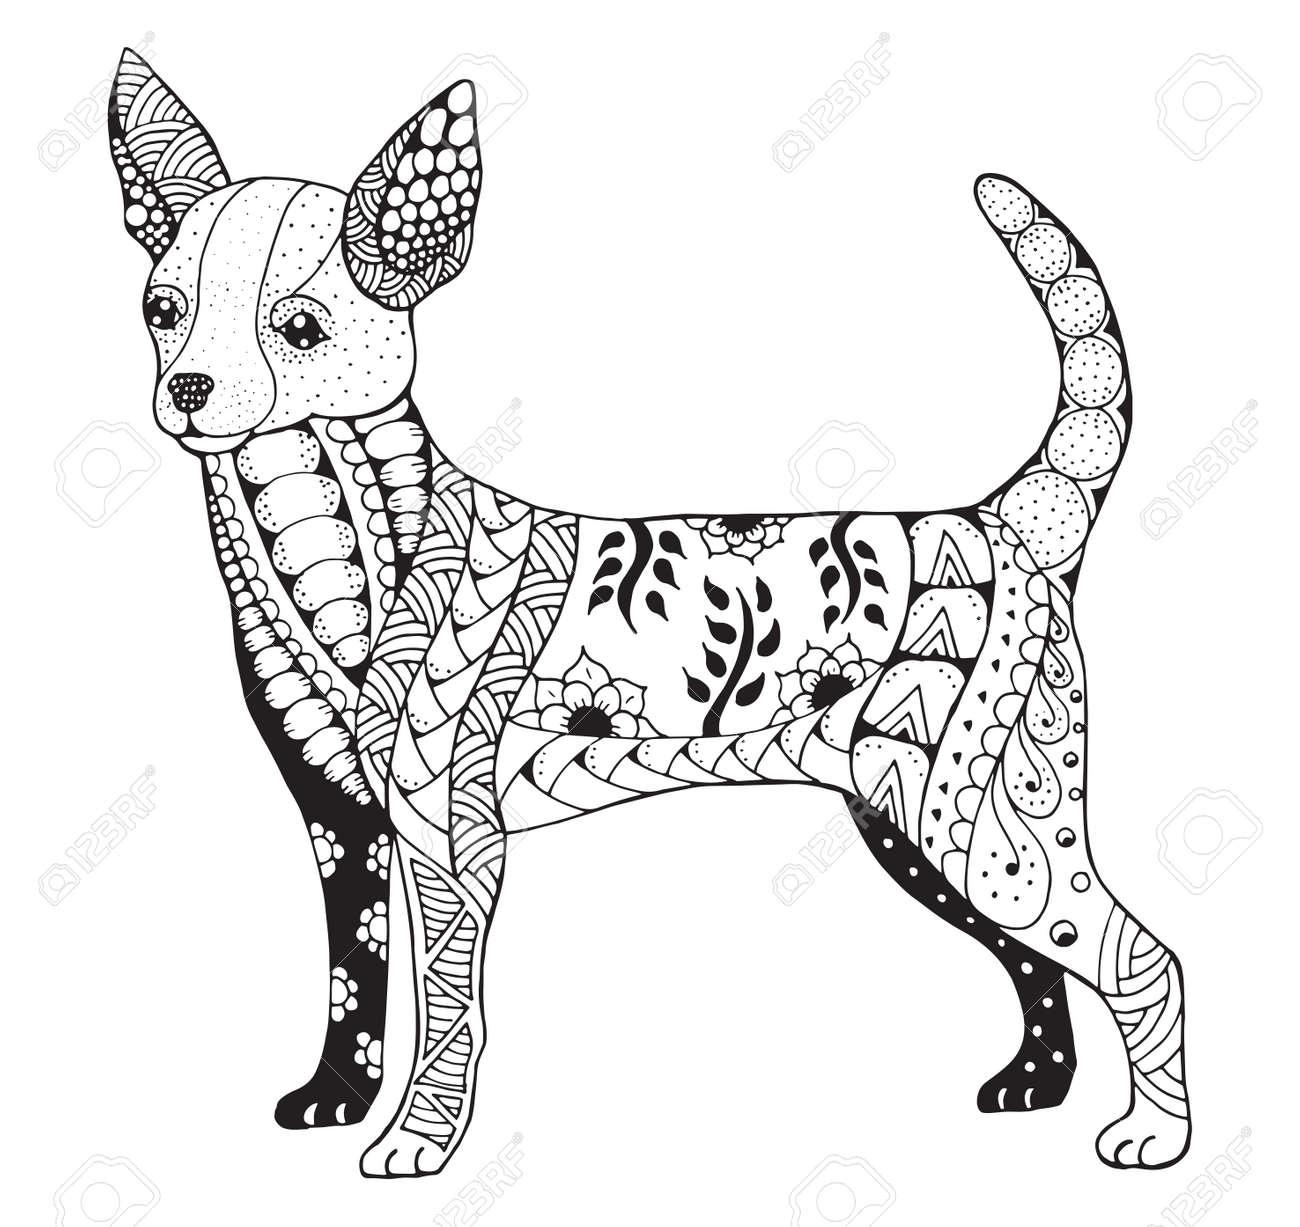 Chihuahua Estilizado, Ejemplo, Lápiz A Mano Alzada, Dibujado A Mano ...